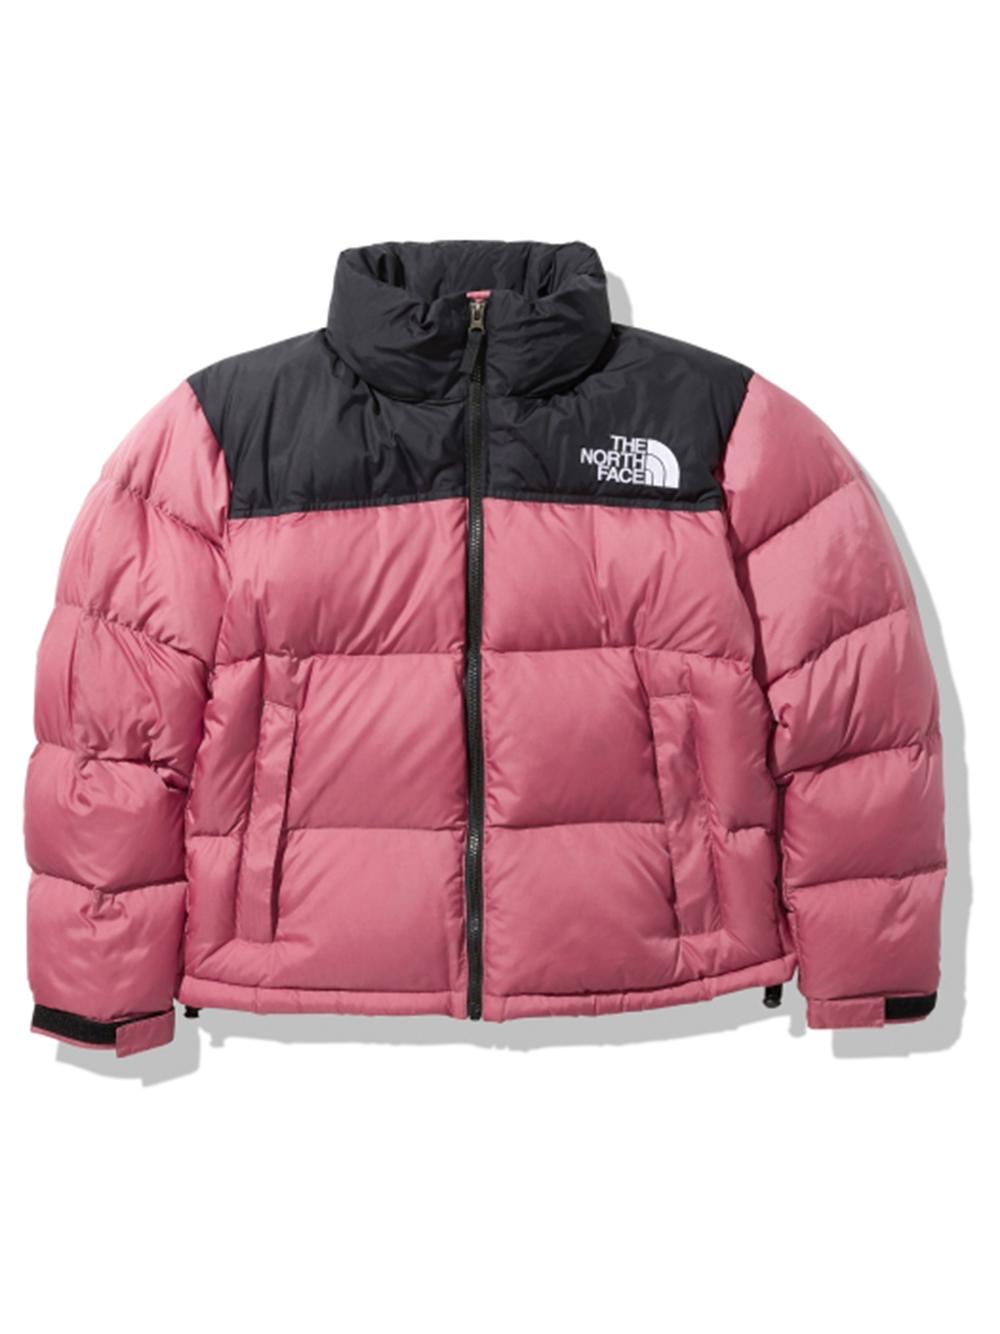 【THE NORTH FACE】Short Nuptse Jacket(ROSE-M)